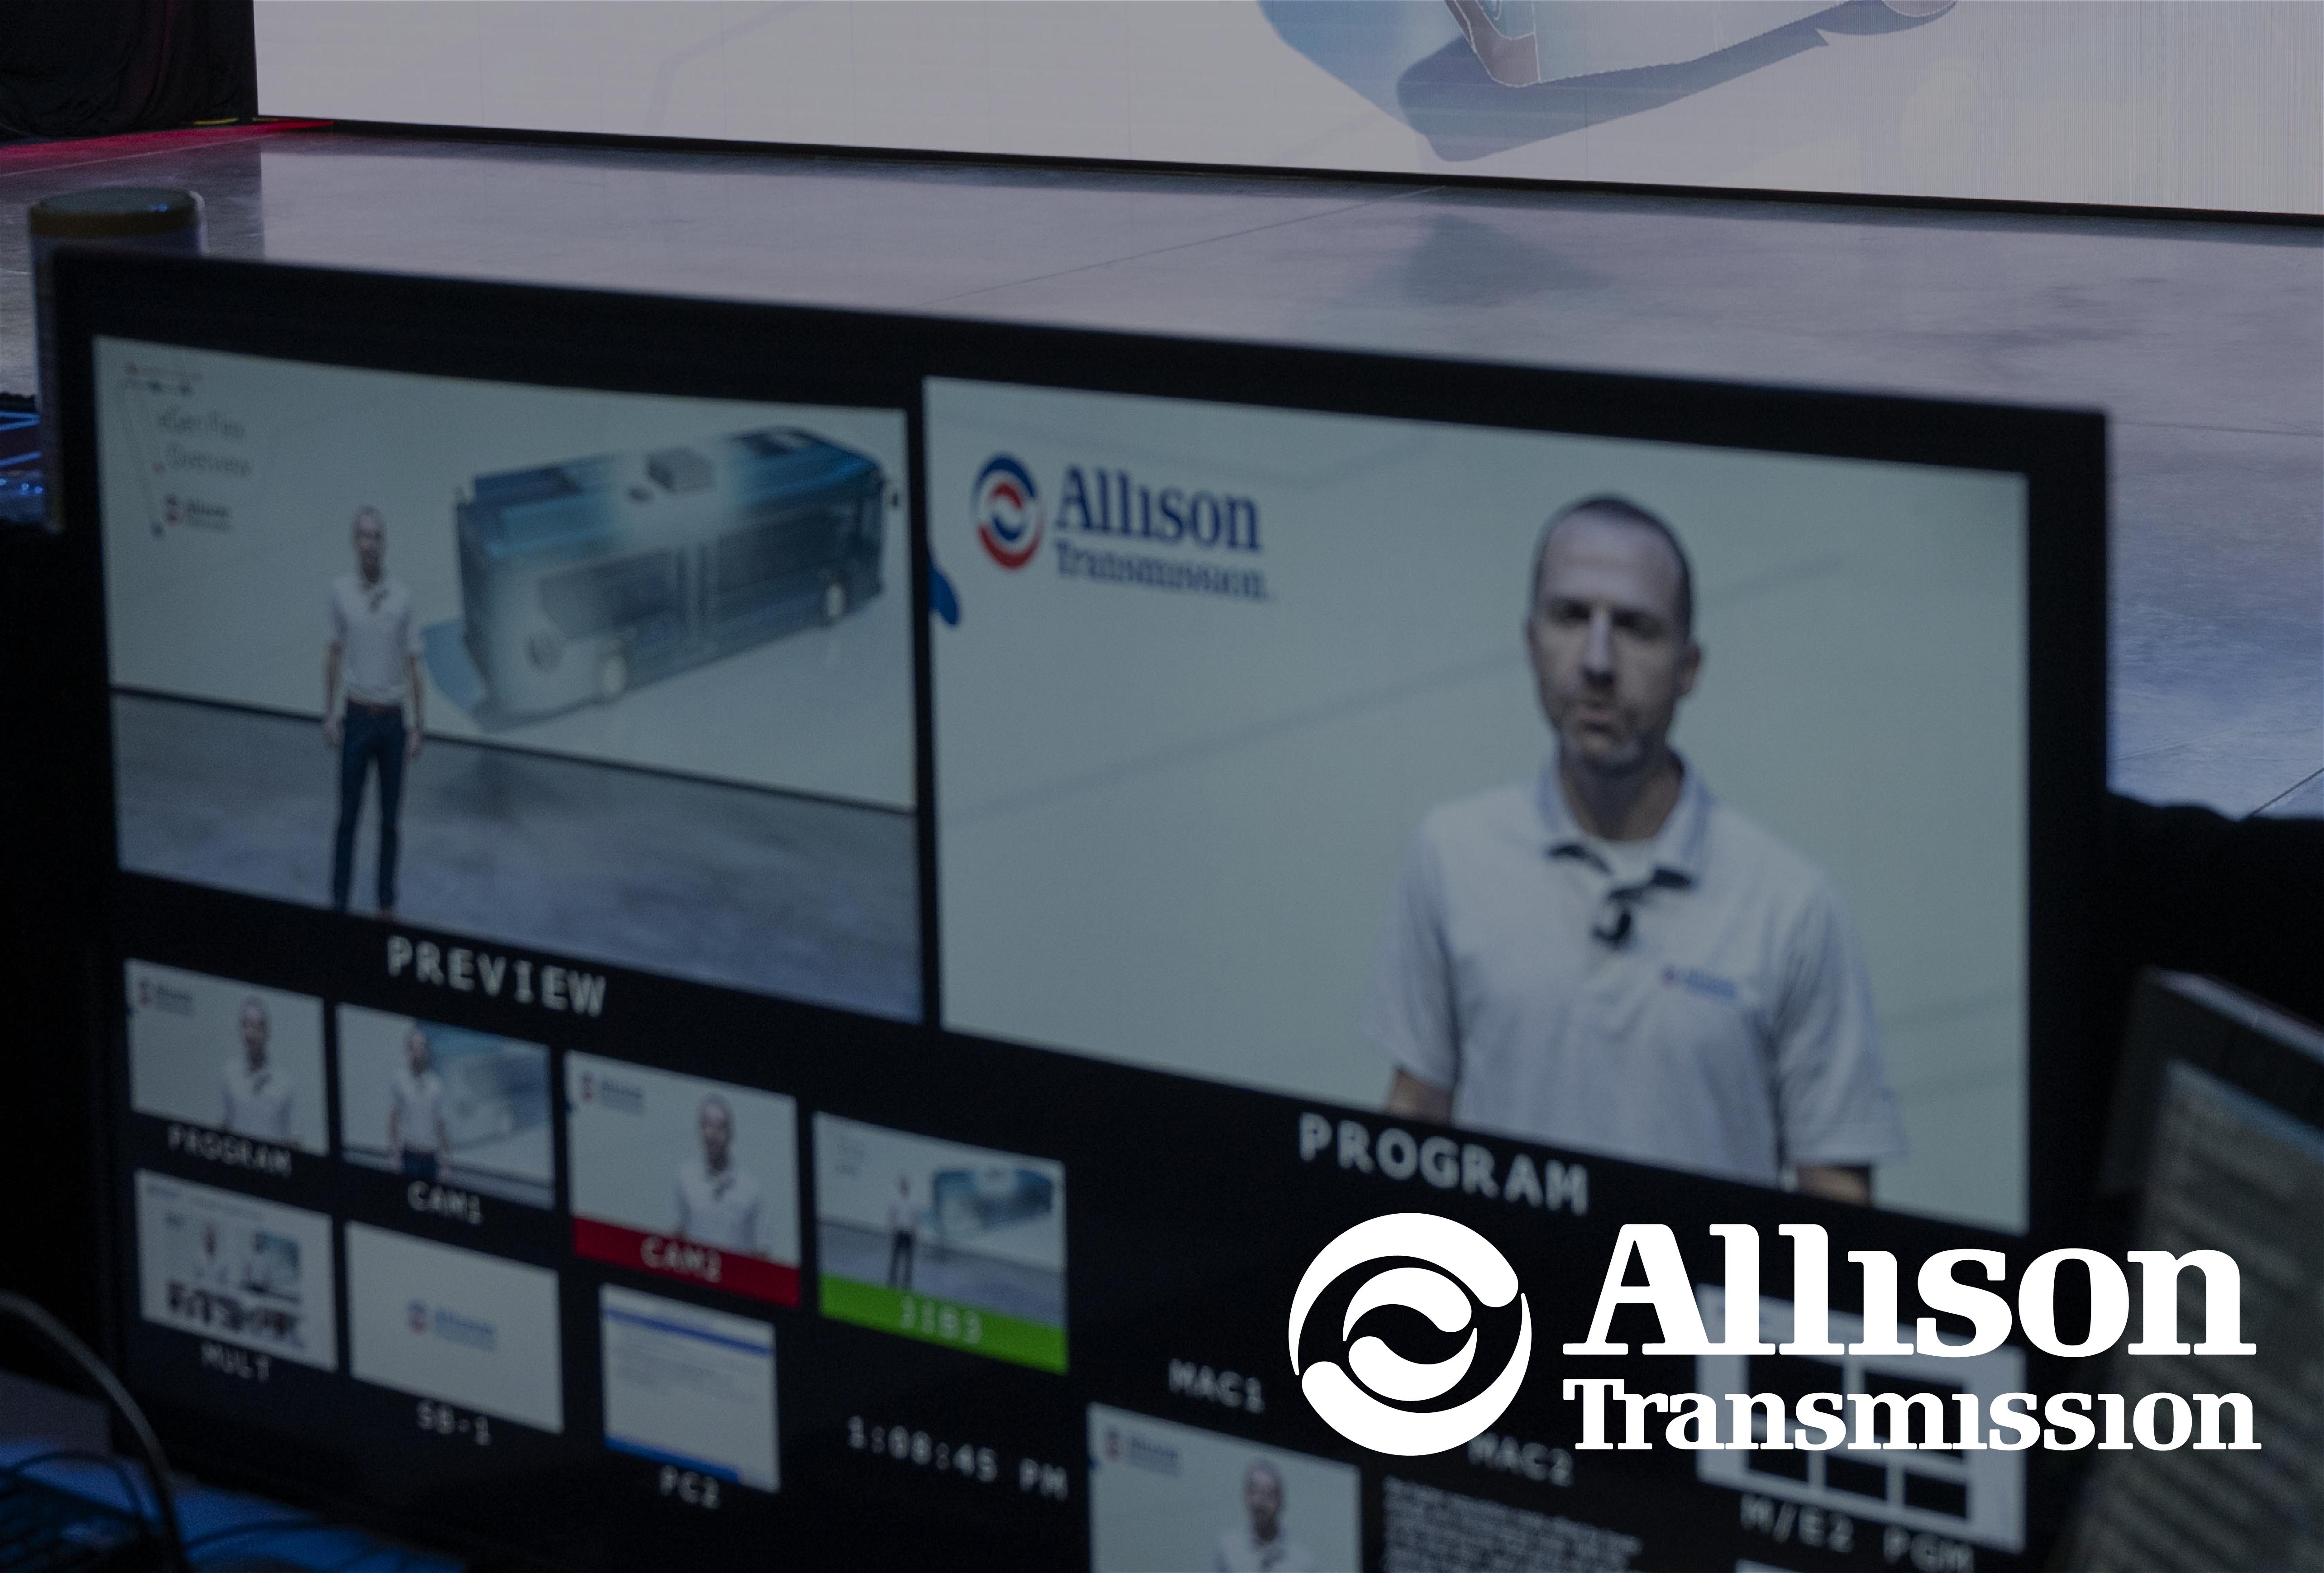 0506 KMA Work Thumbnails AT Events Virtual Events: Allison Transmission